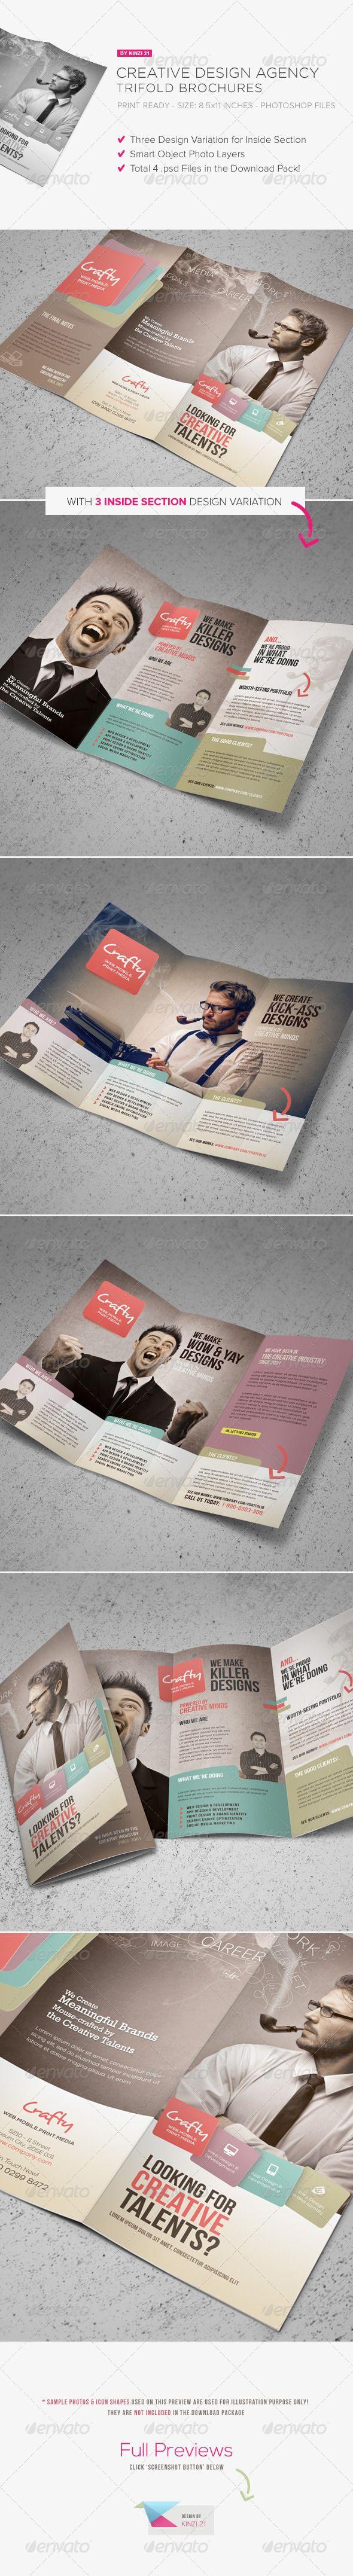 Creative Design Agency Trifold Brochure by kinzi21